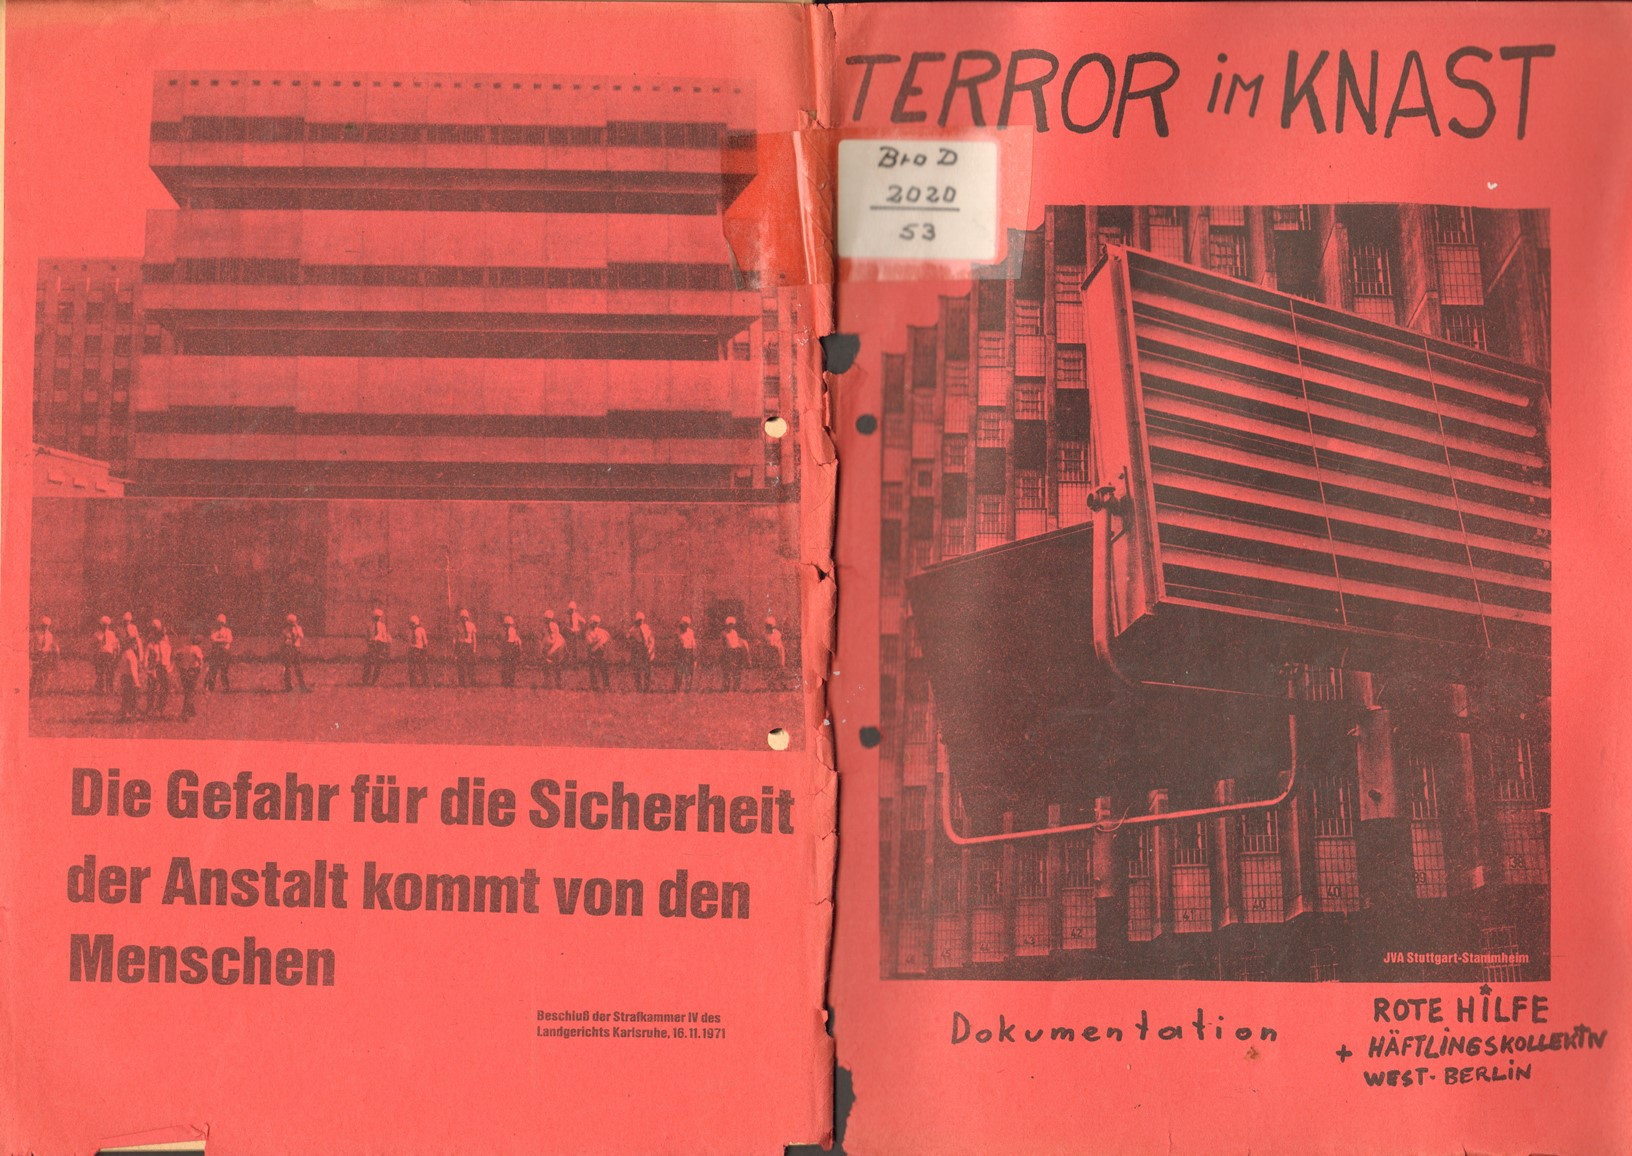 Berlin_RH_1974_Terror_im_Knast_01